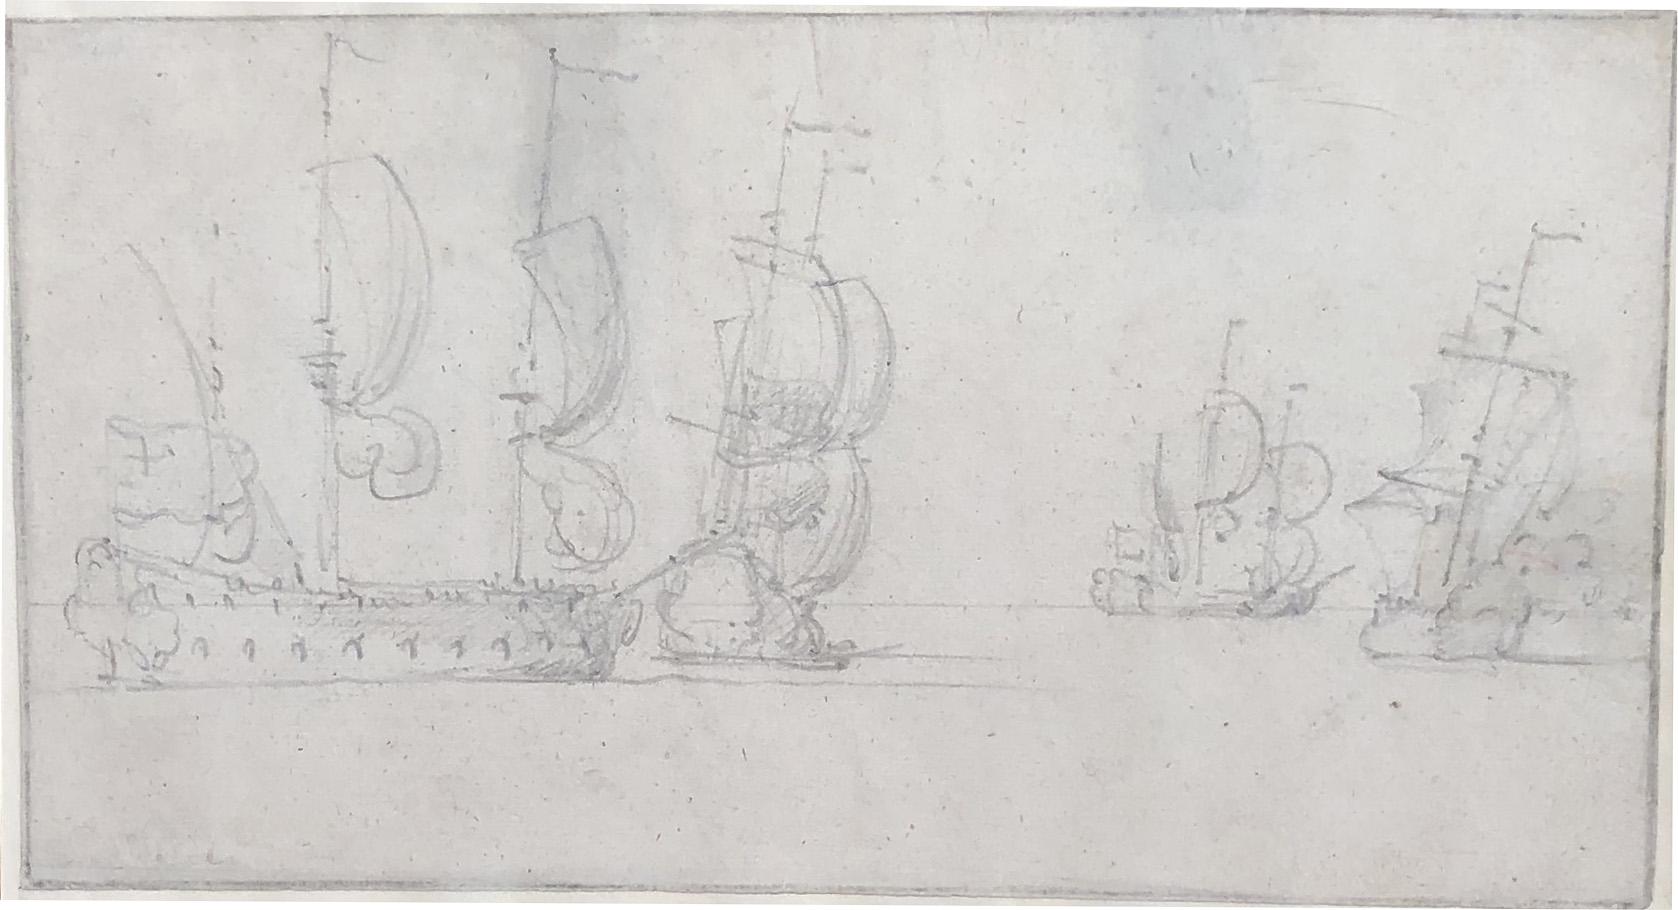 Shipping manouevring at Sea